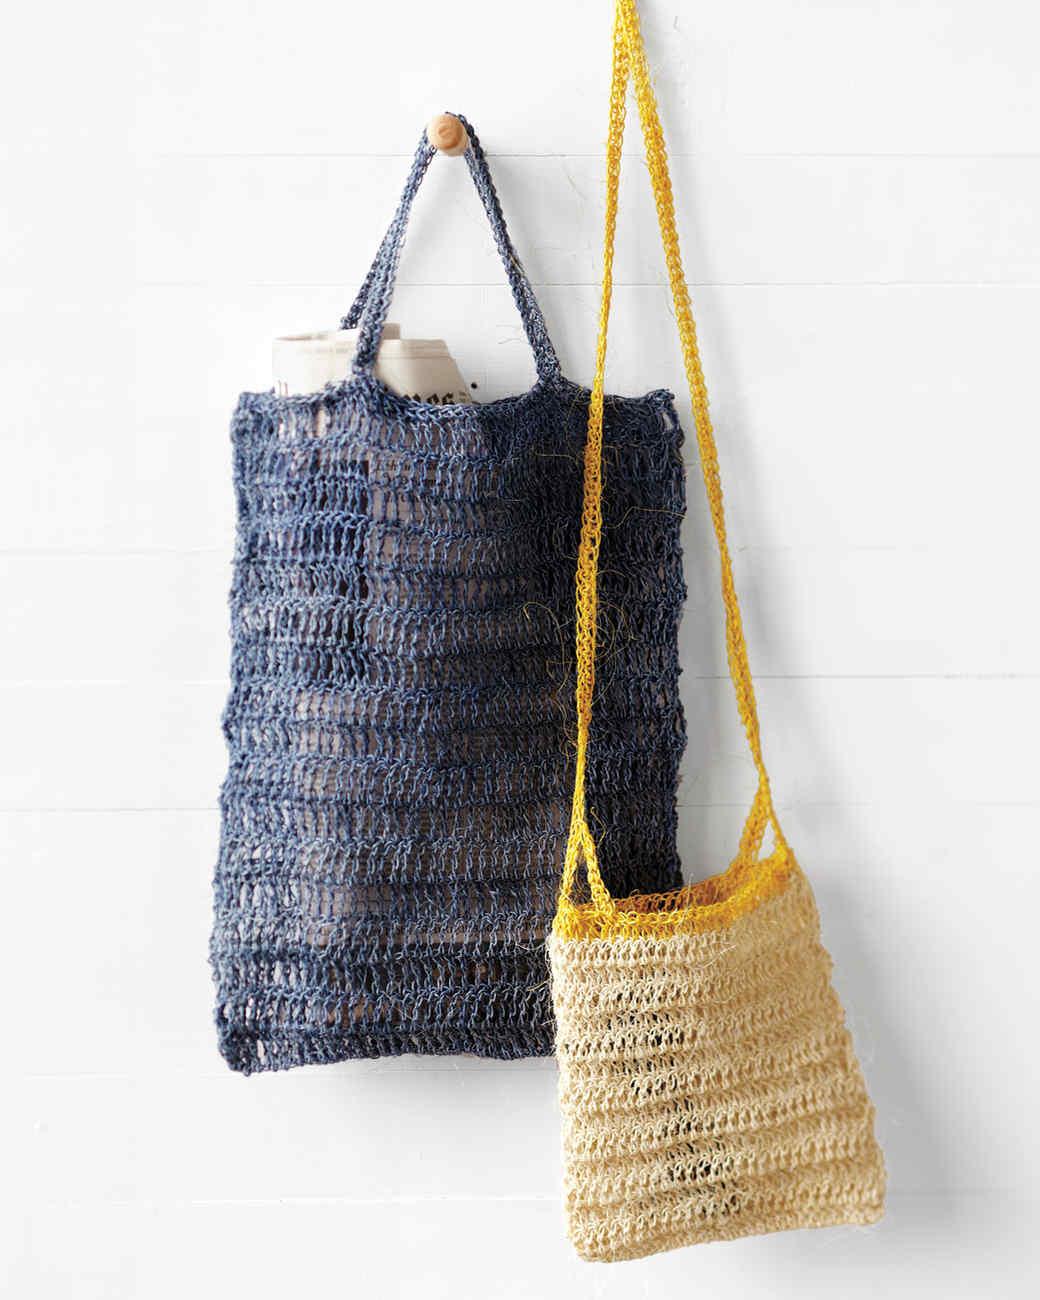 VIDA Tote Bag - 4th of July, Made in USA by VIDA